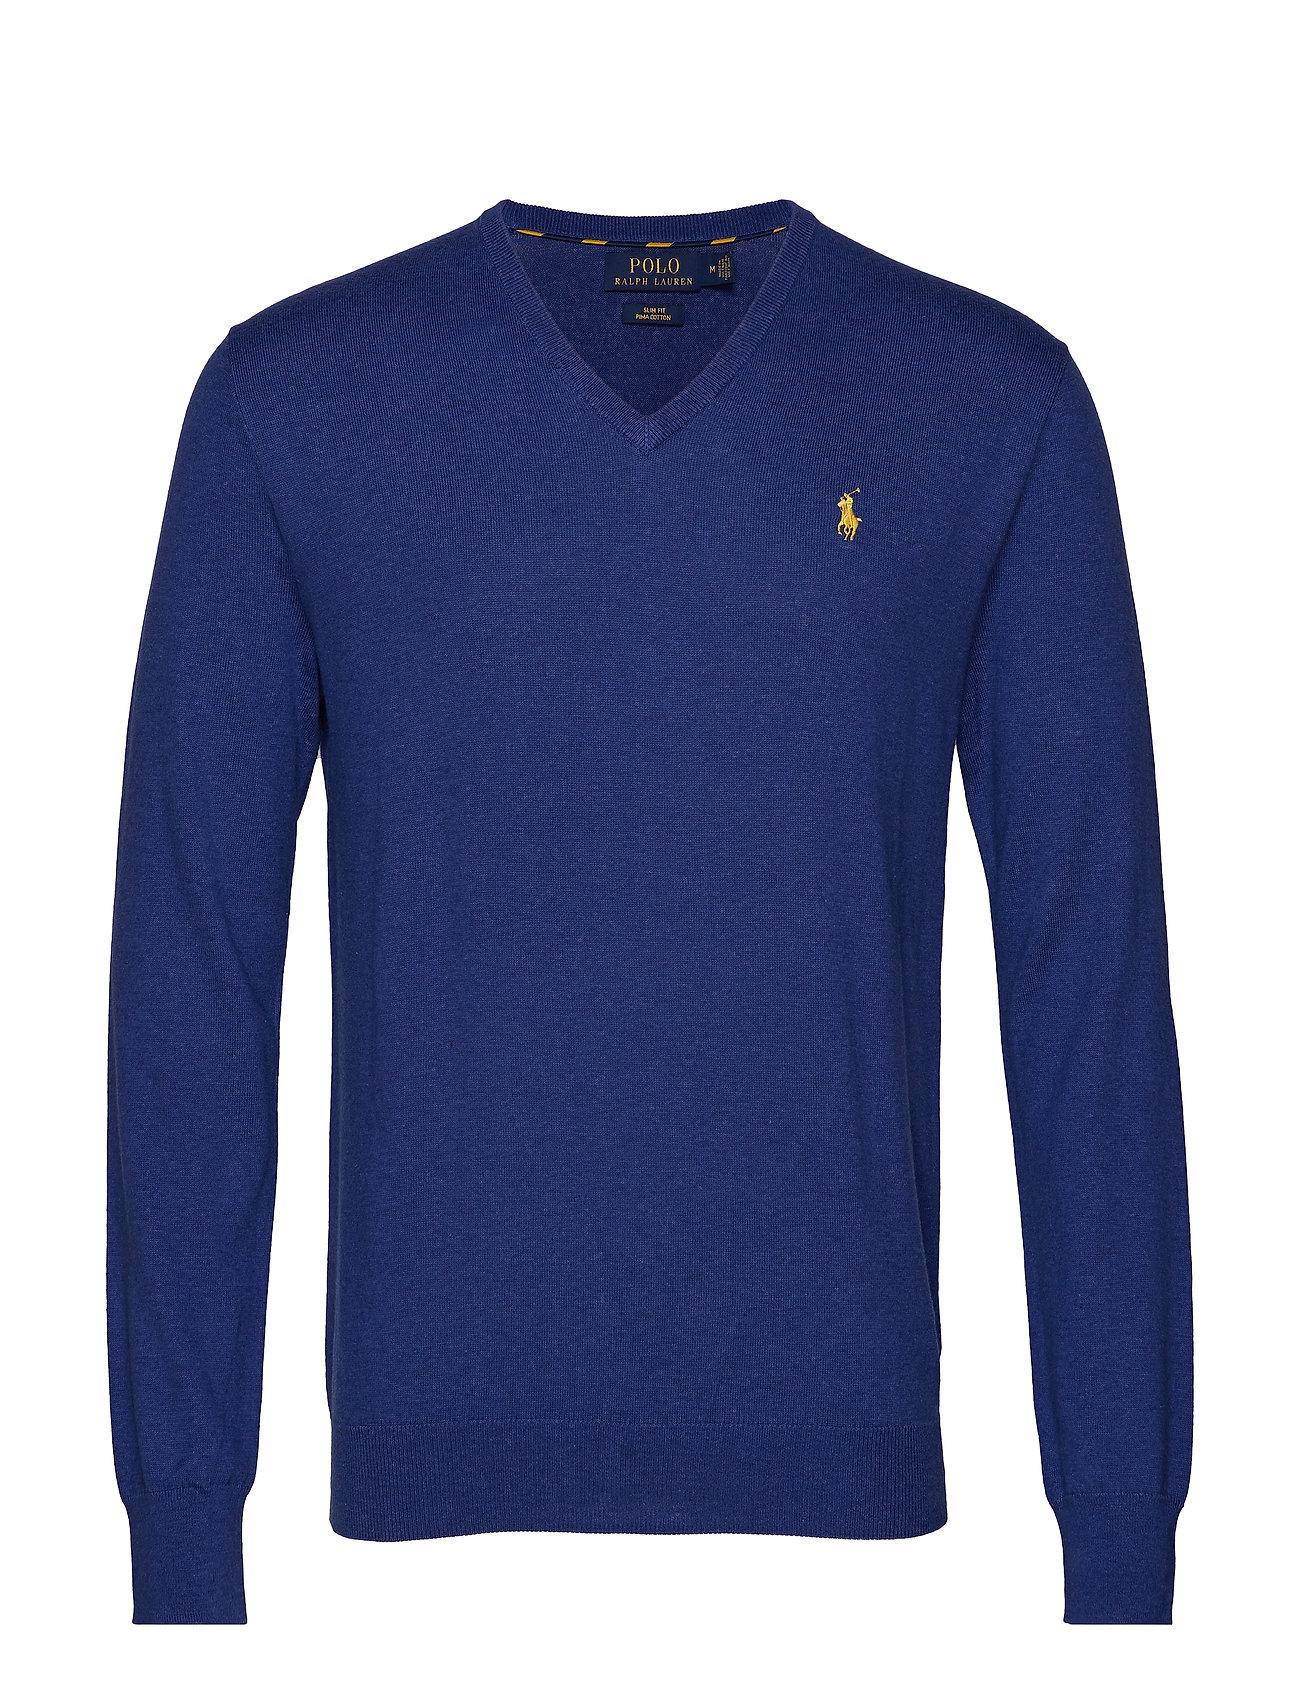 Polo Ralph Lauren Slim Fit Cotton V-Neck Sweater - YACHT BLUE HEATHE